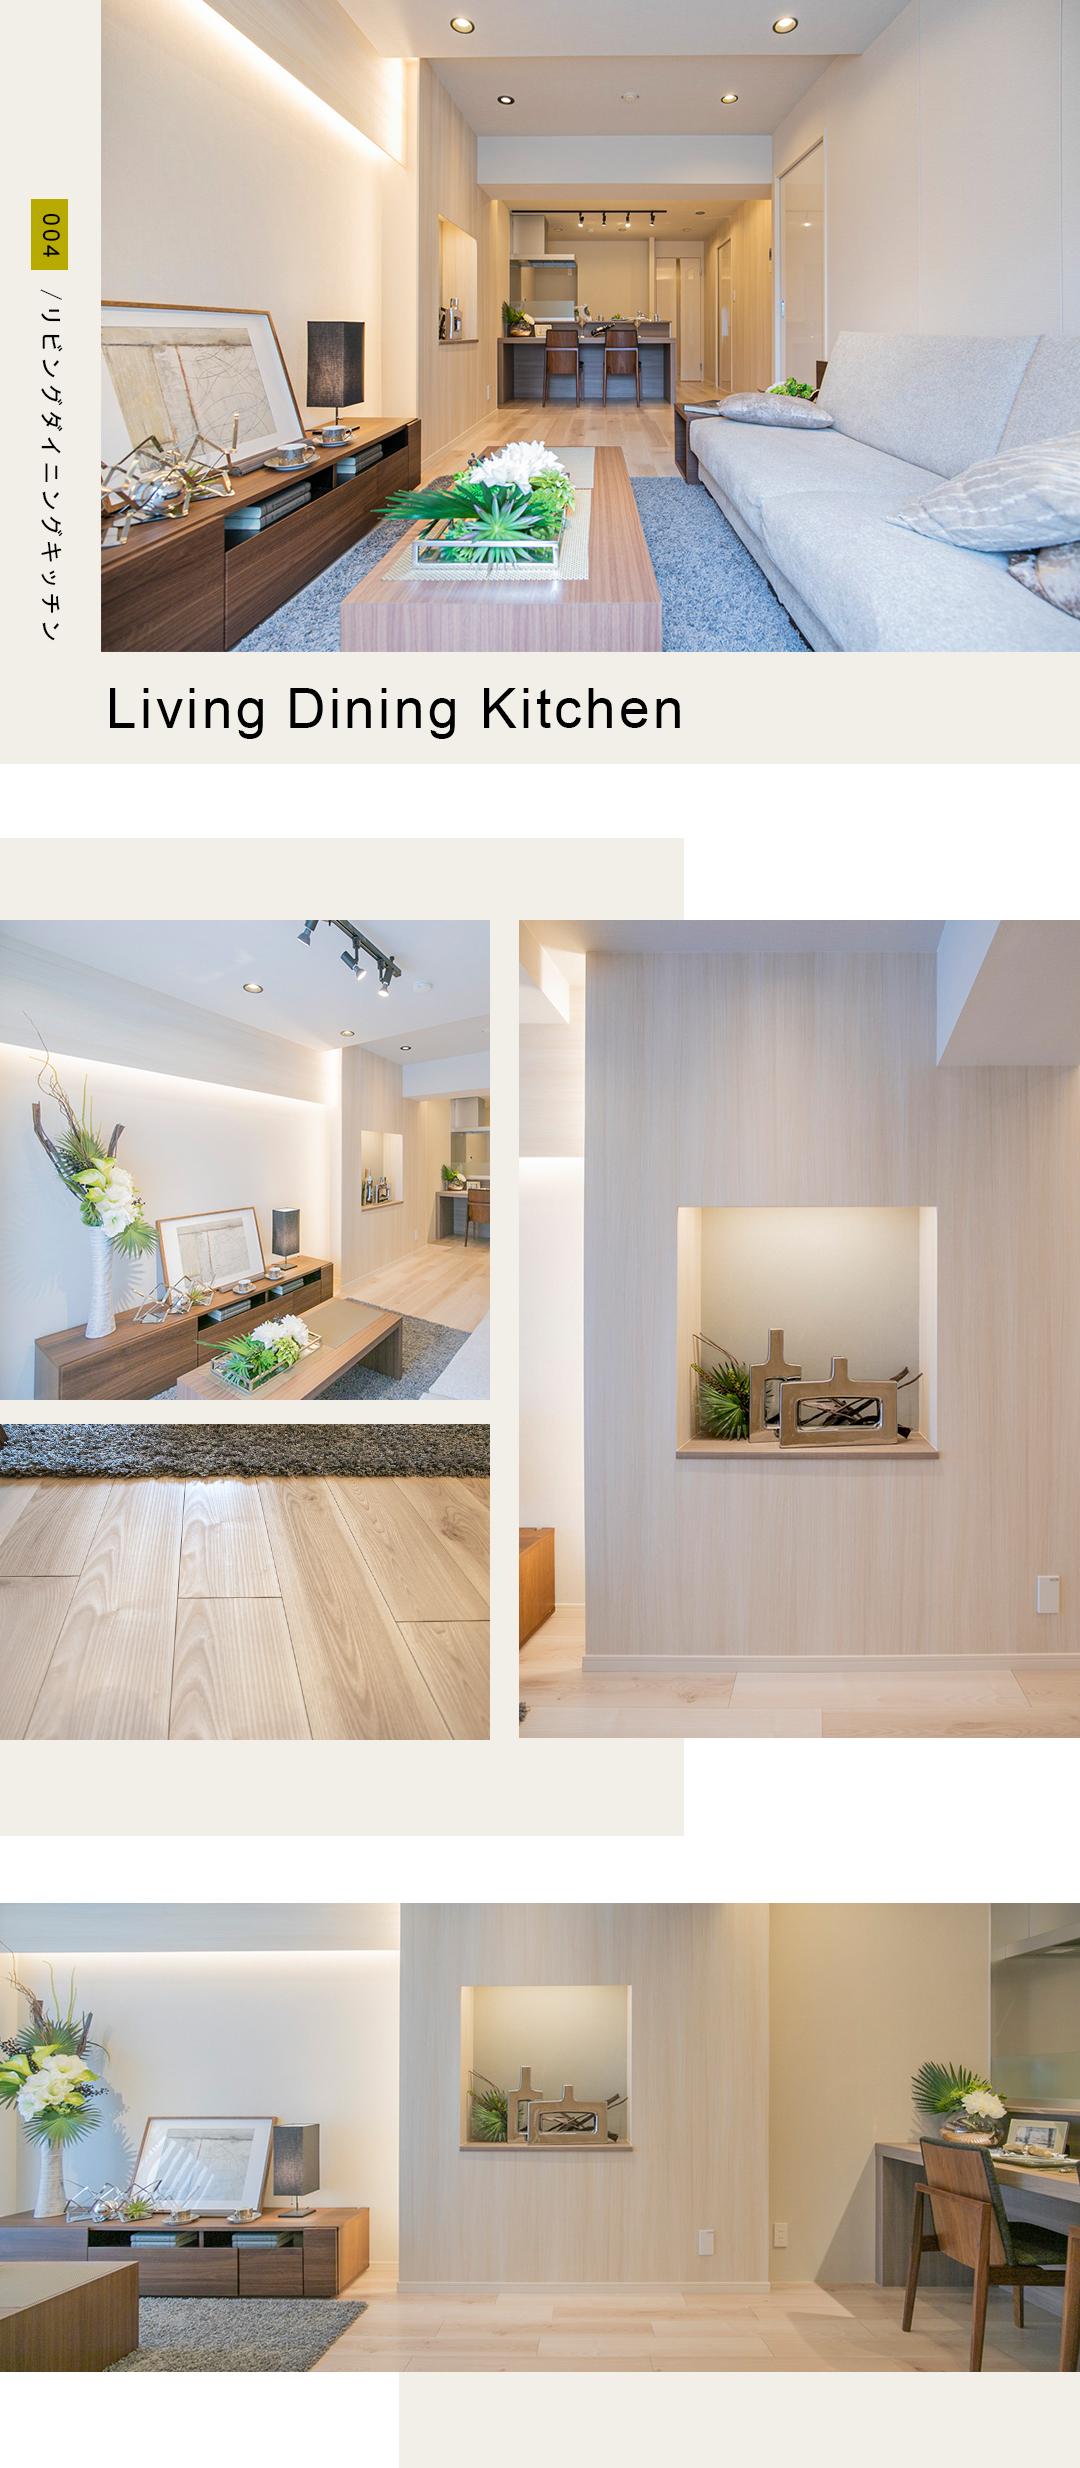 004,LivingDiningKitchen,リビングダイニングキッチン,